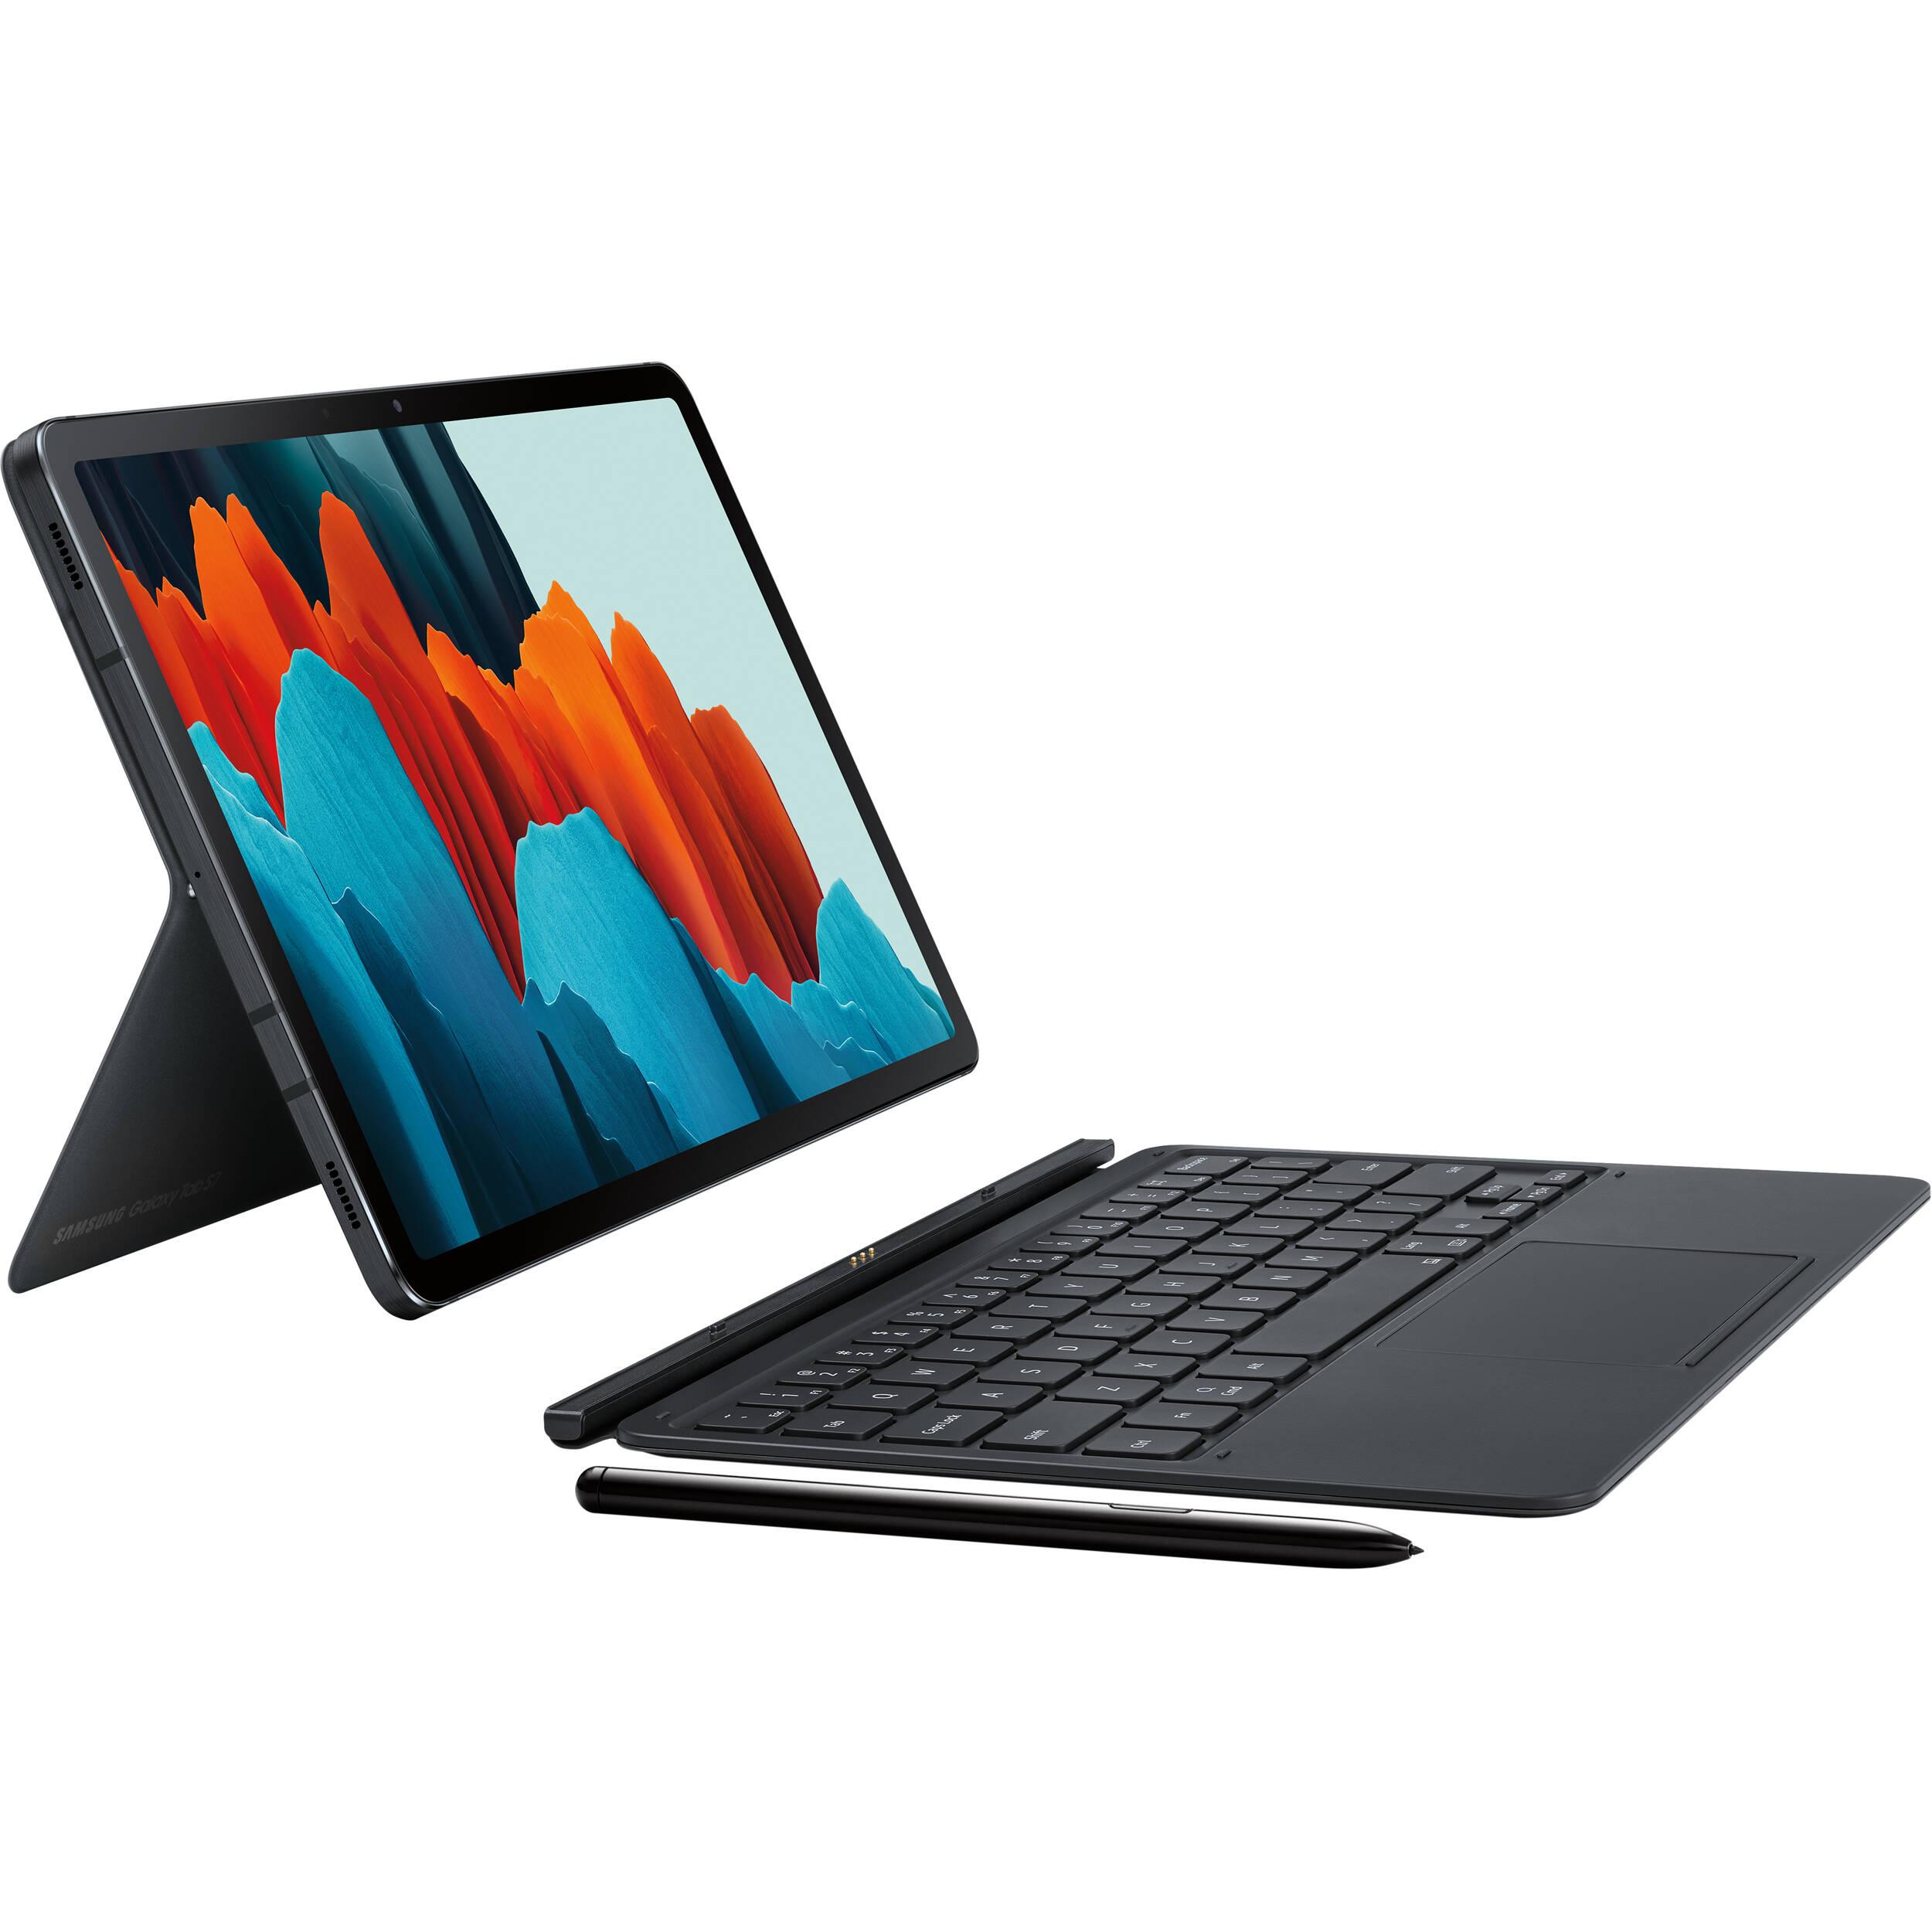 Samsung Book Cover Keyboard for Galaxy Tab S7 EF-DT870UBEGUJ B&H